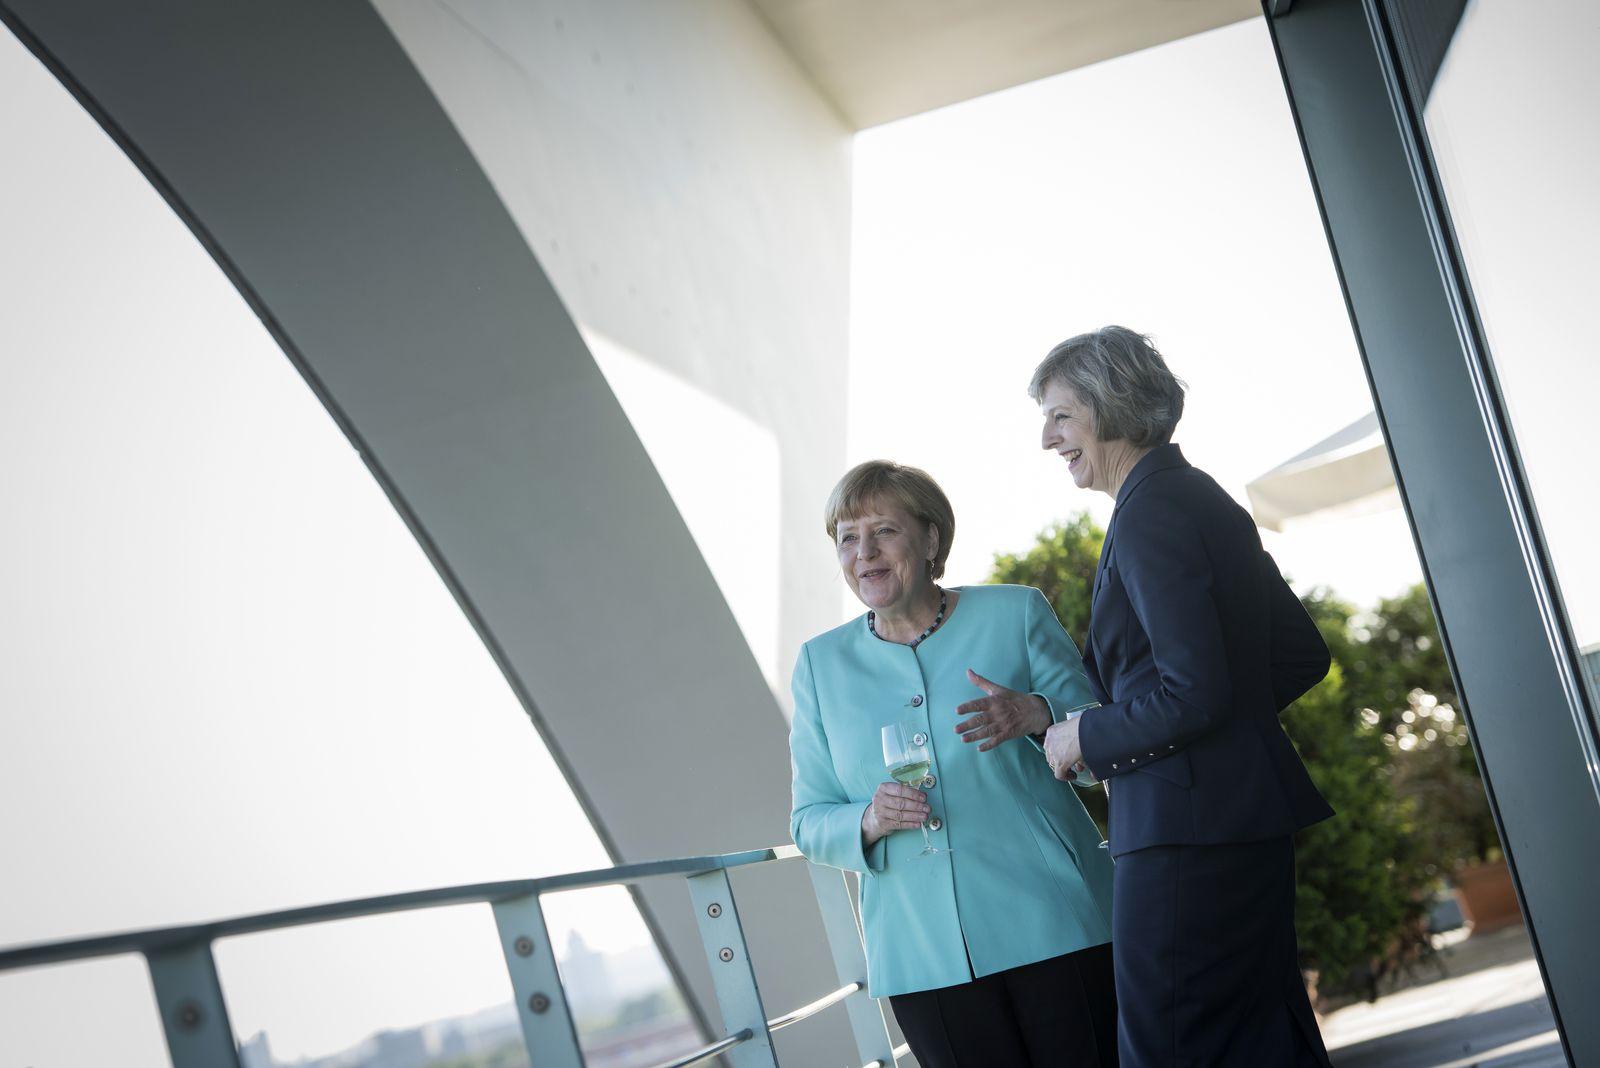 Angela Merkel / Theresa May